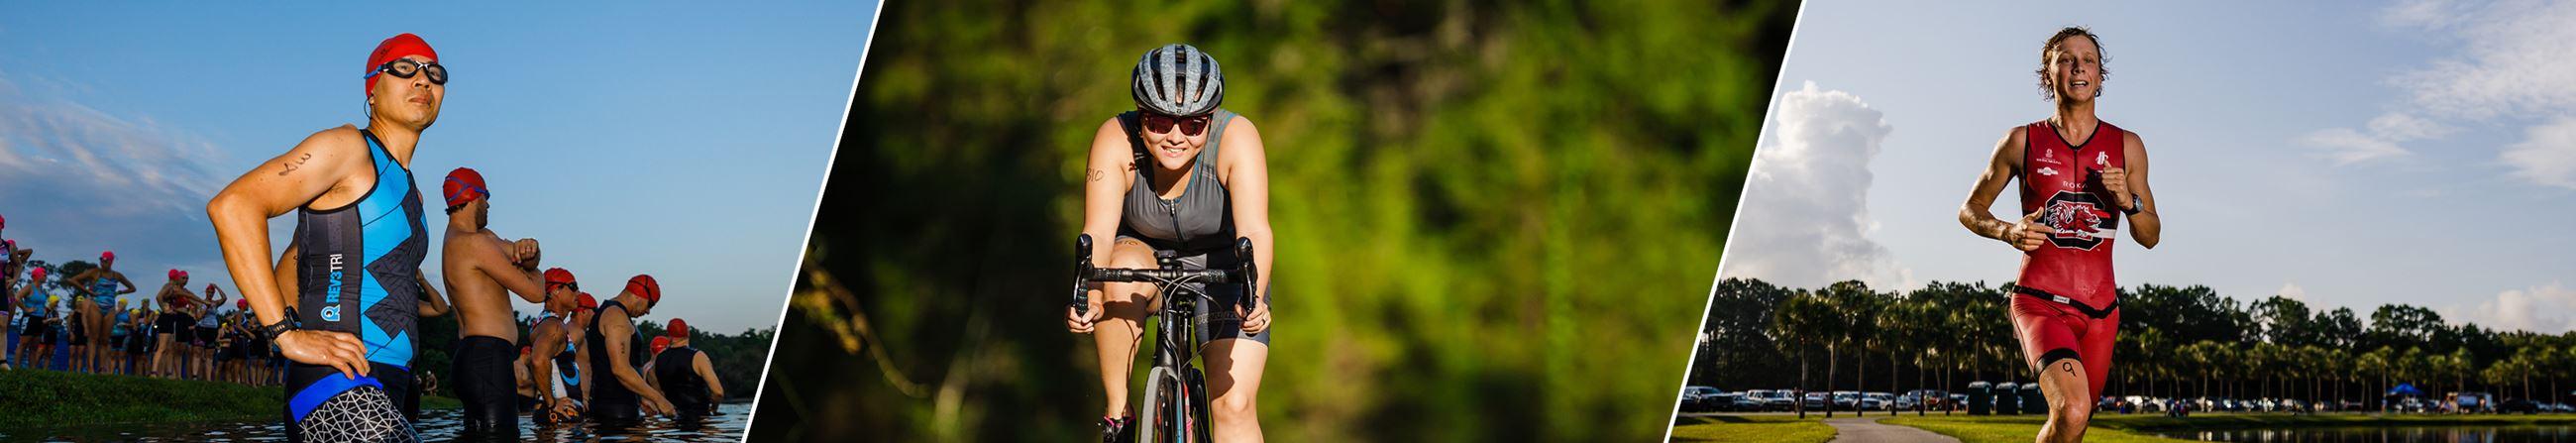 Athletes swimming, biking and running in the Charleston Sprint Triathlon